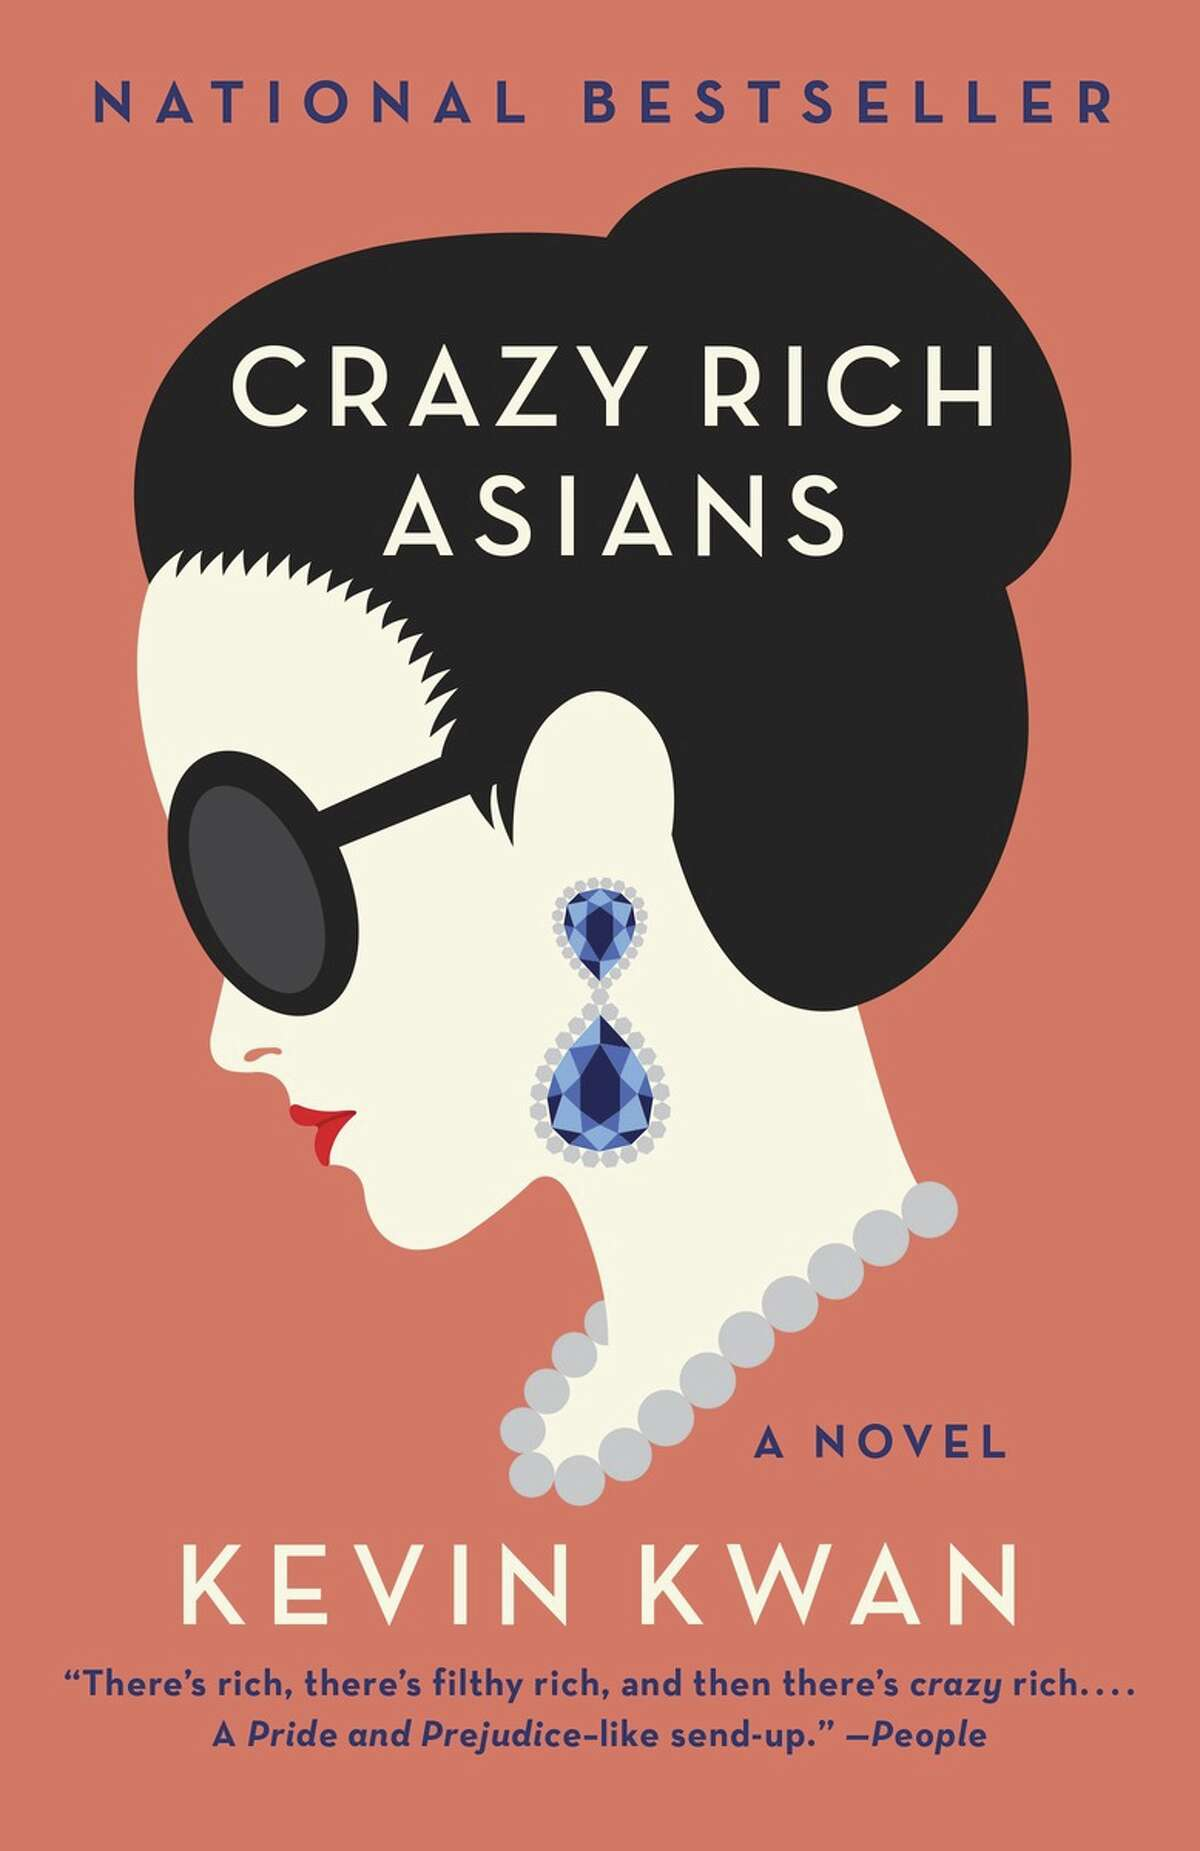 Bestseller Kevin Kwan's